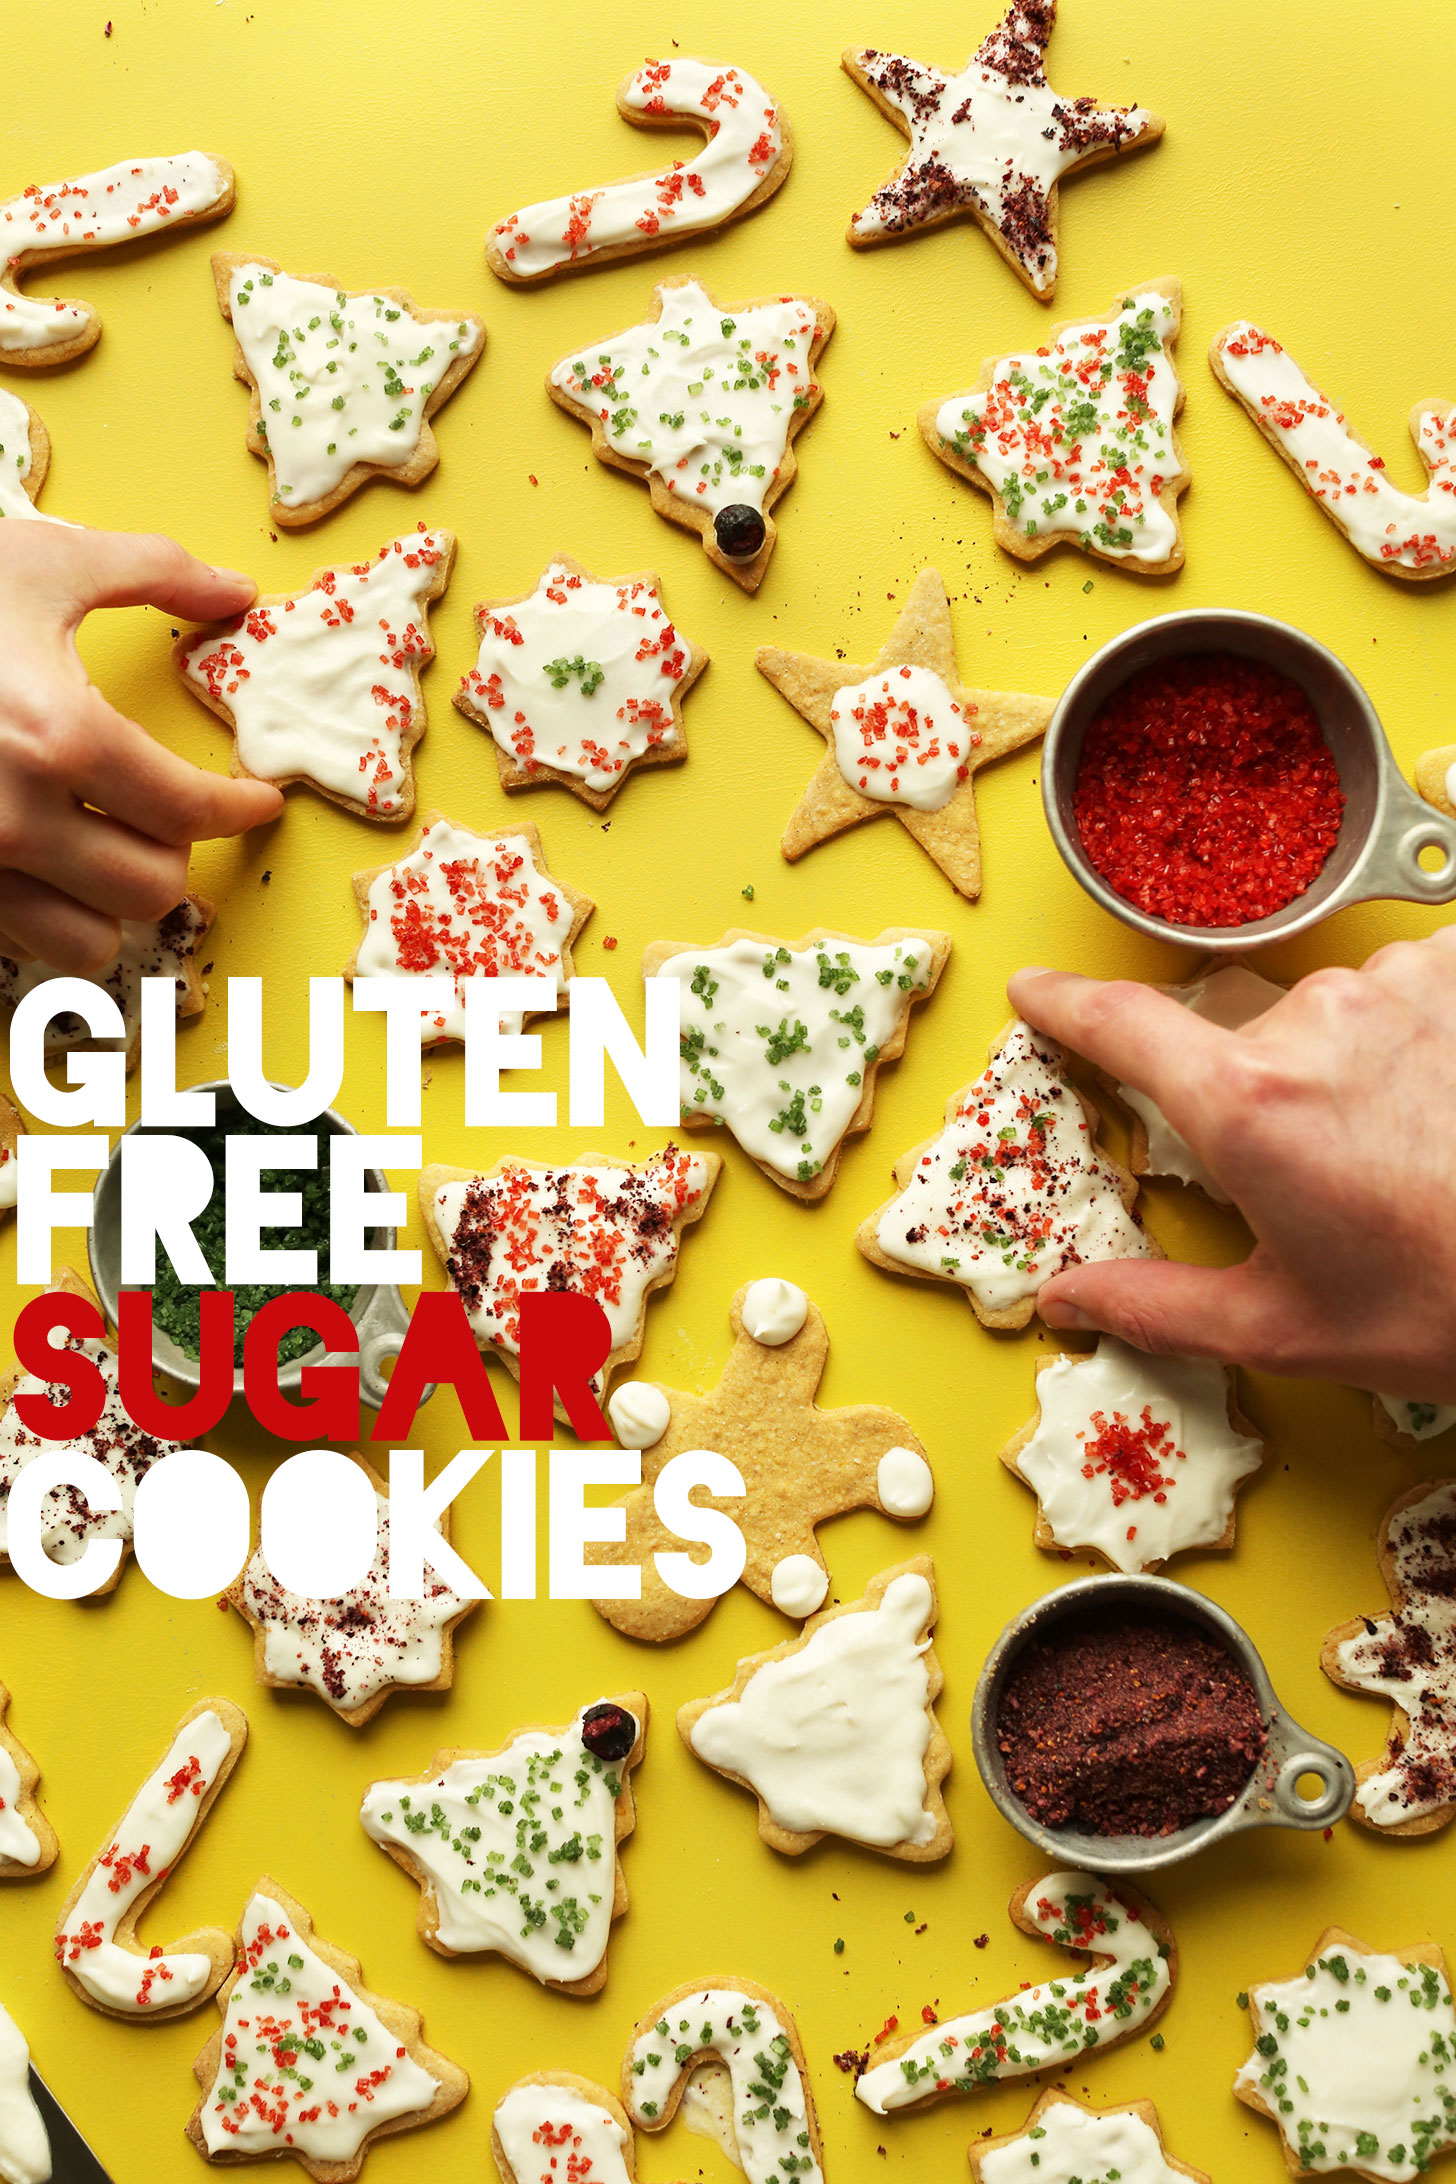 EASY Gluten-Free Sugar Cookies! No eggs, no dairy, NO BUTTER! #vegan #glutenfree #cookies #dessert #recipe #minimalistbaker